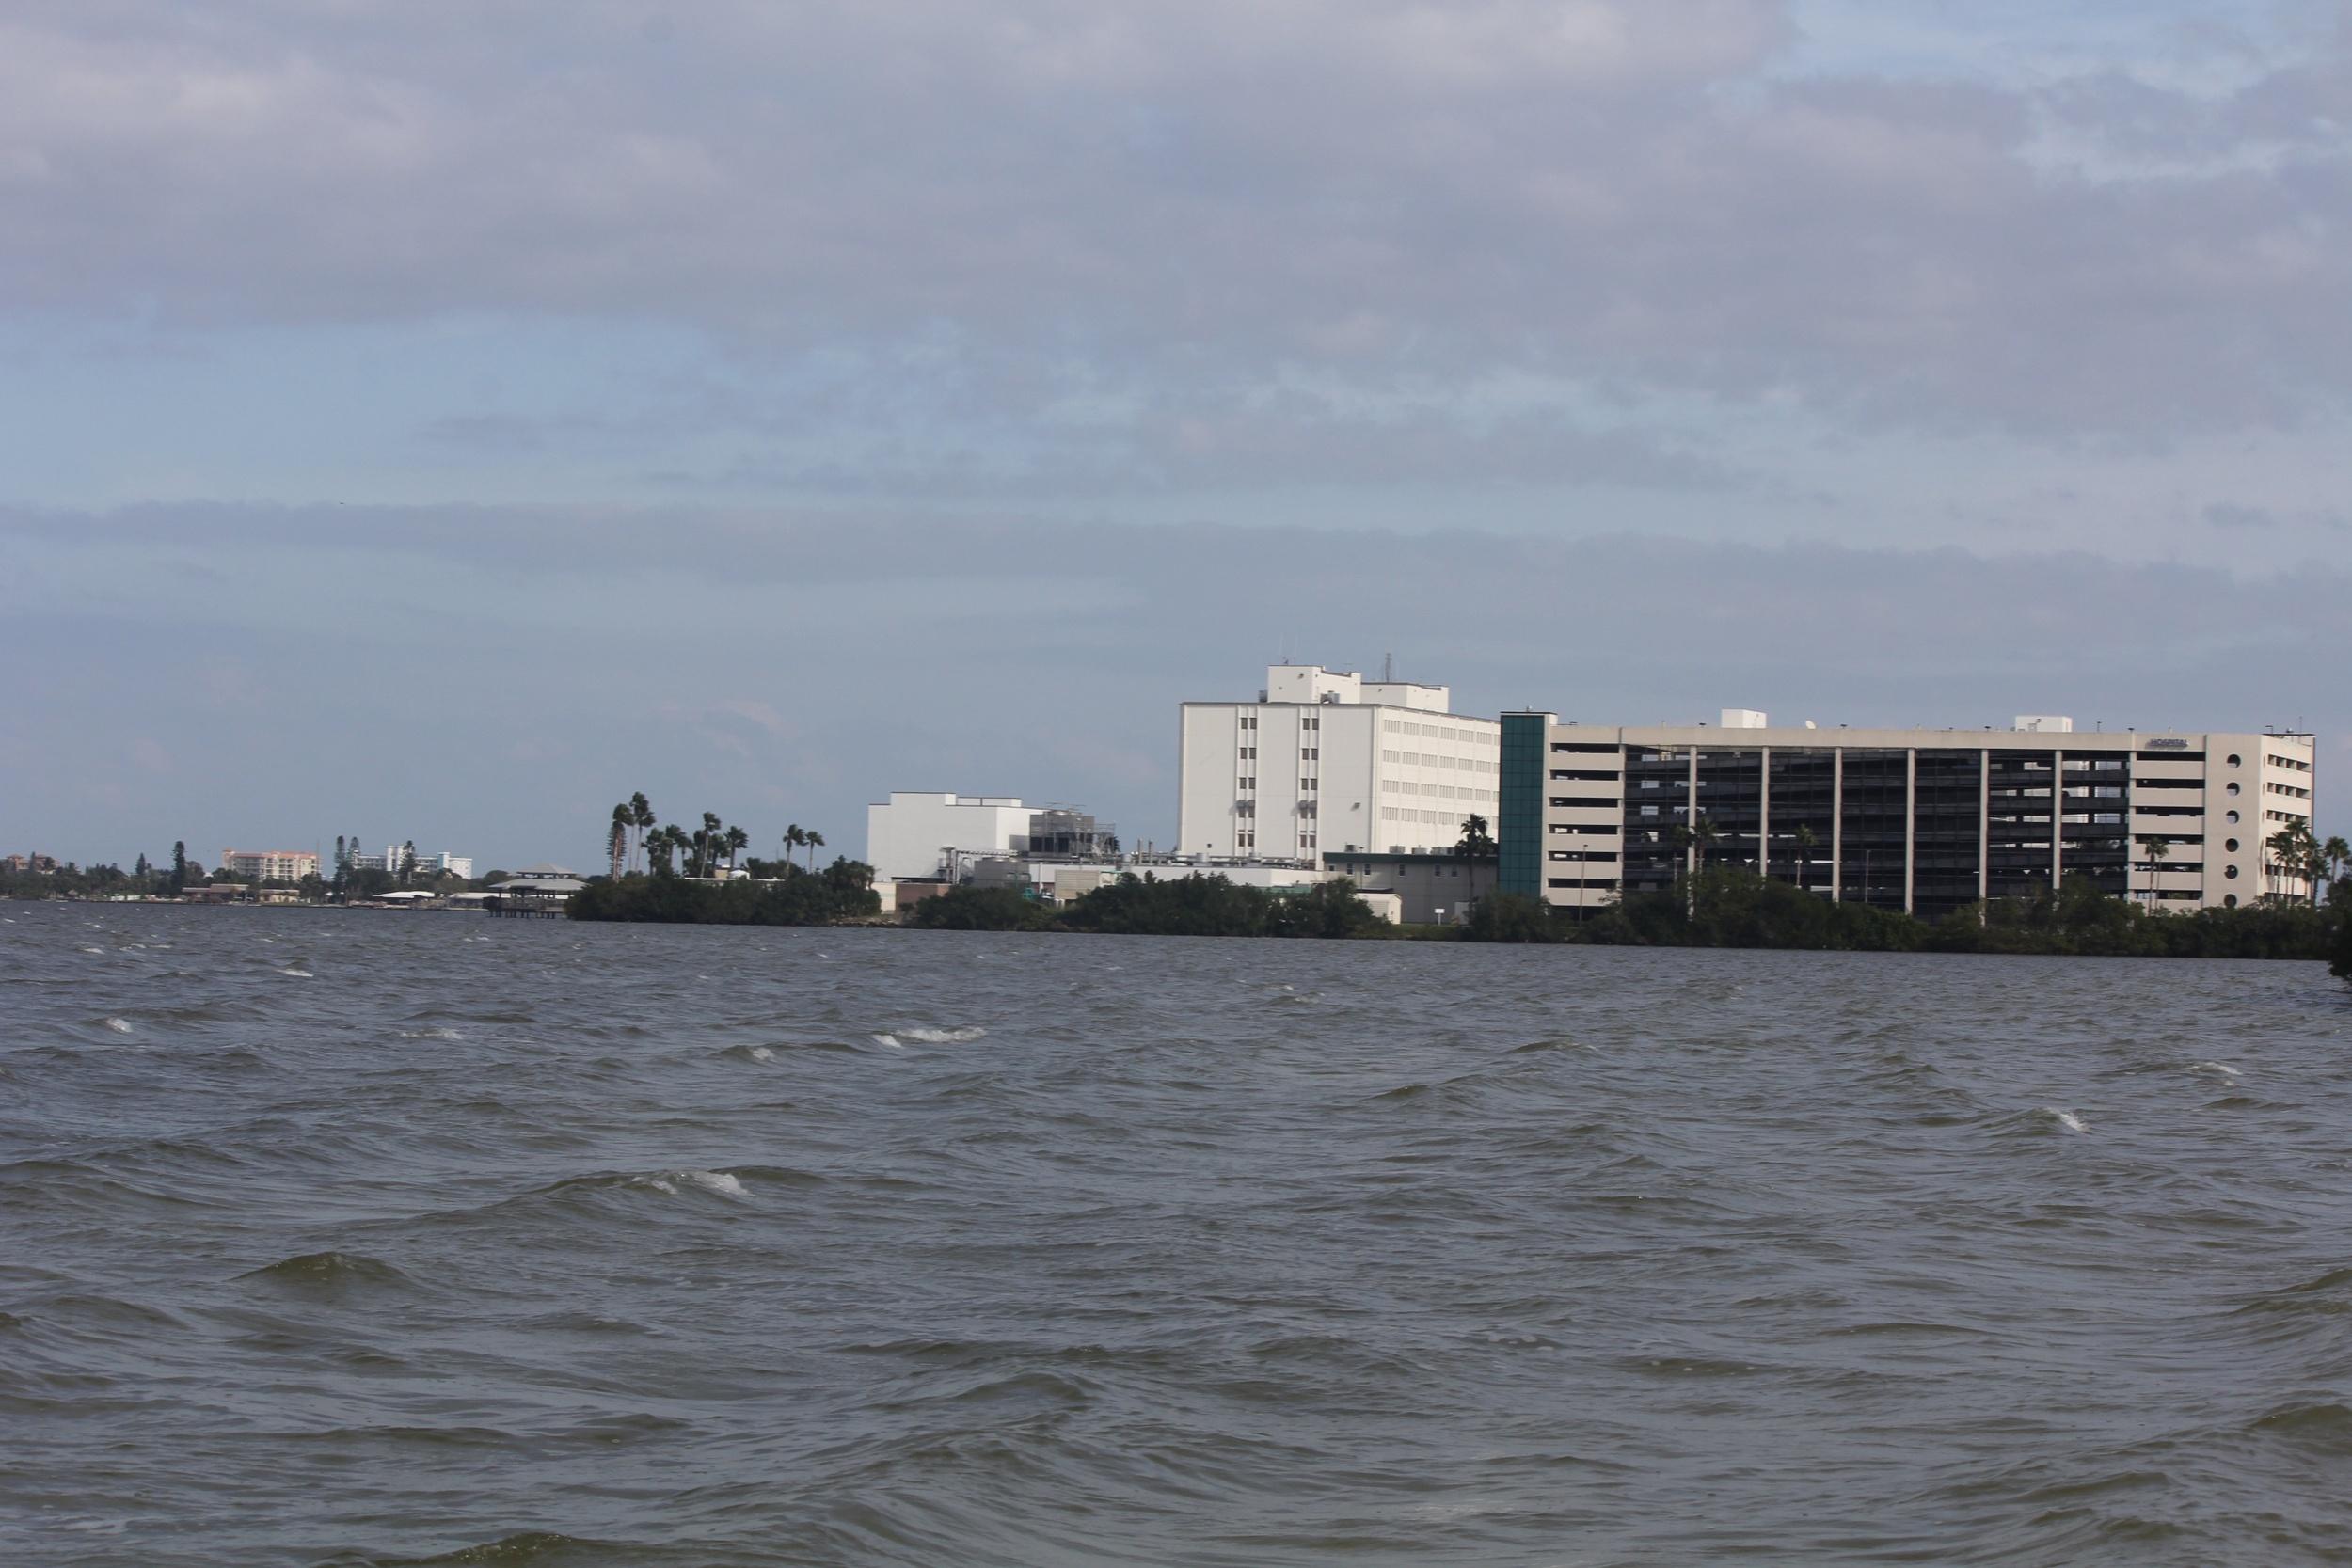 The hospital where Jacky may work someday soon. We windsurf right past the employee gazebo/dock.